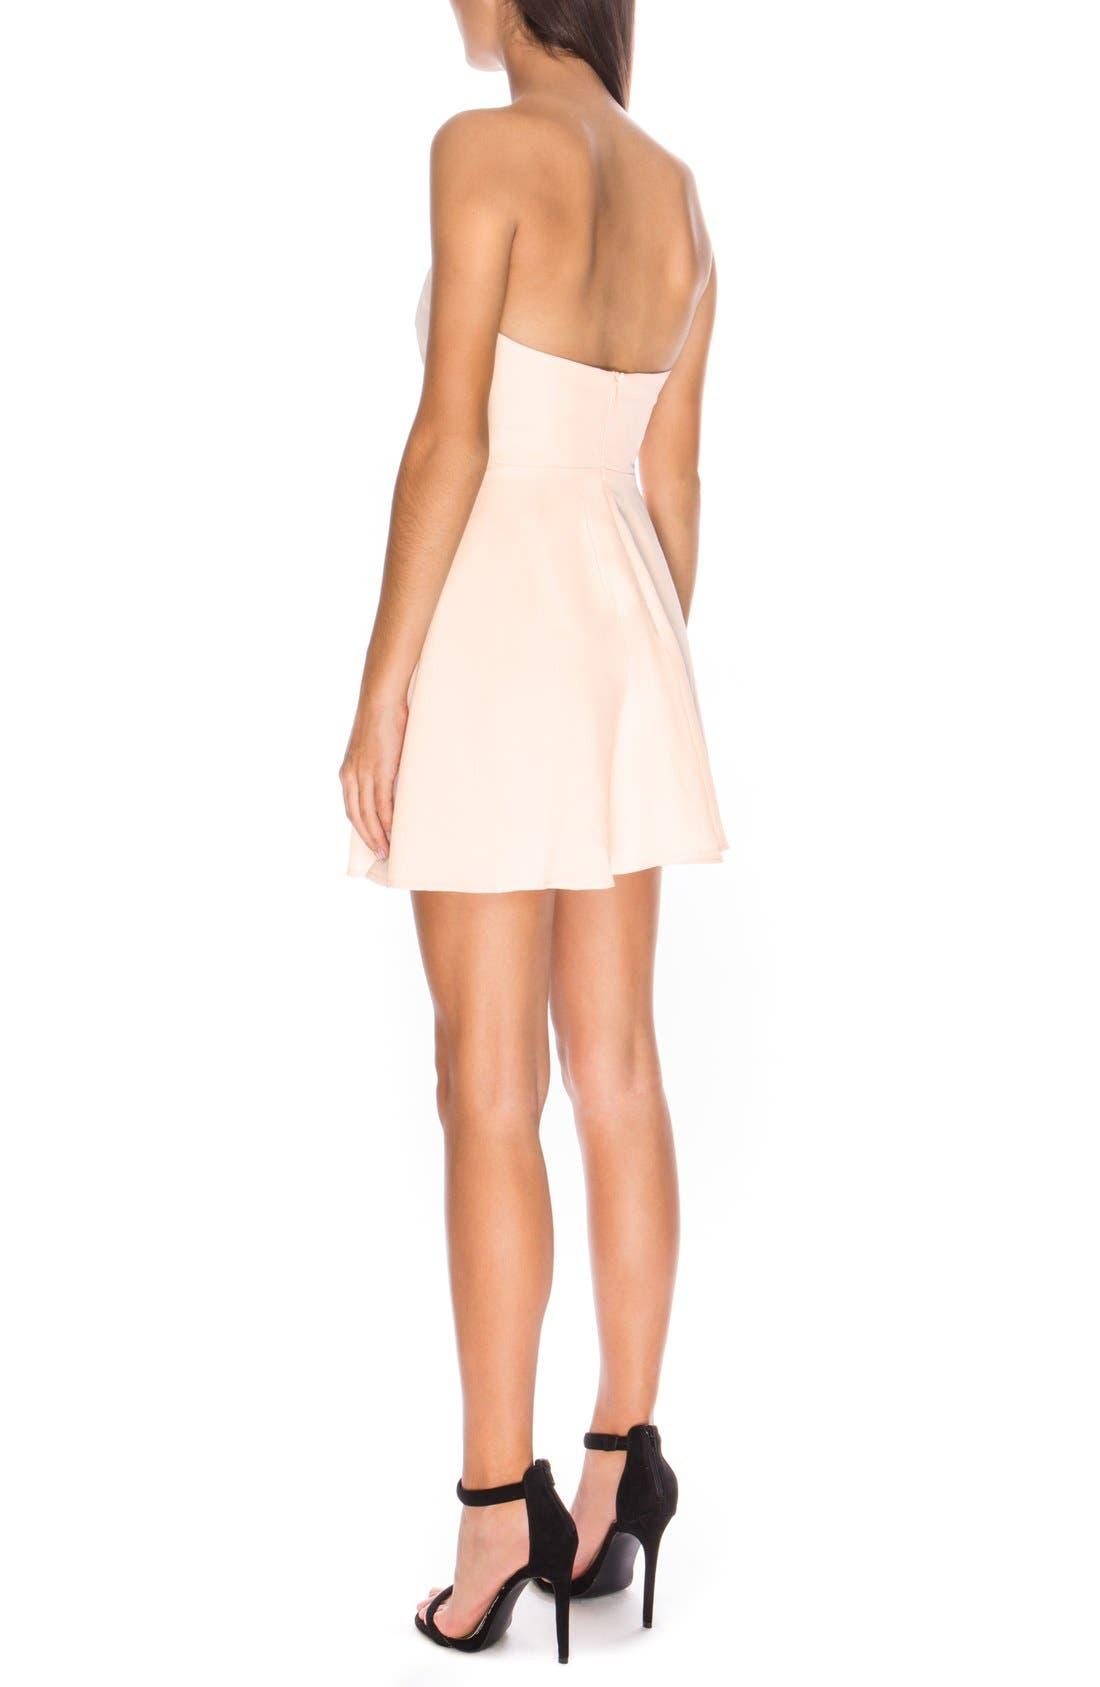 Alternate Image 2  - Keepsake the Label 'Get Free' Strapless Minidress